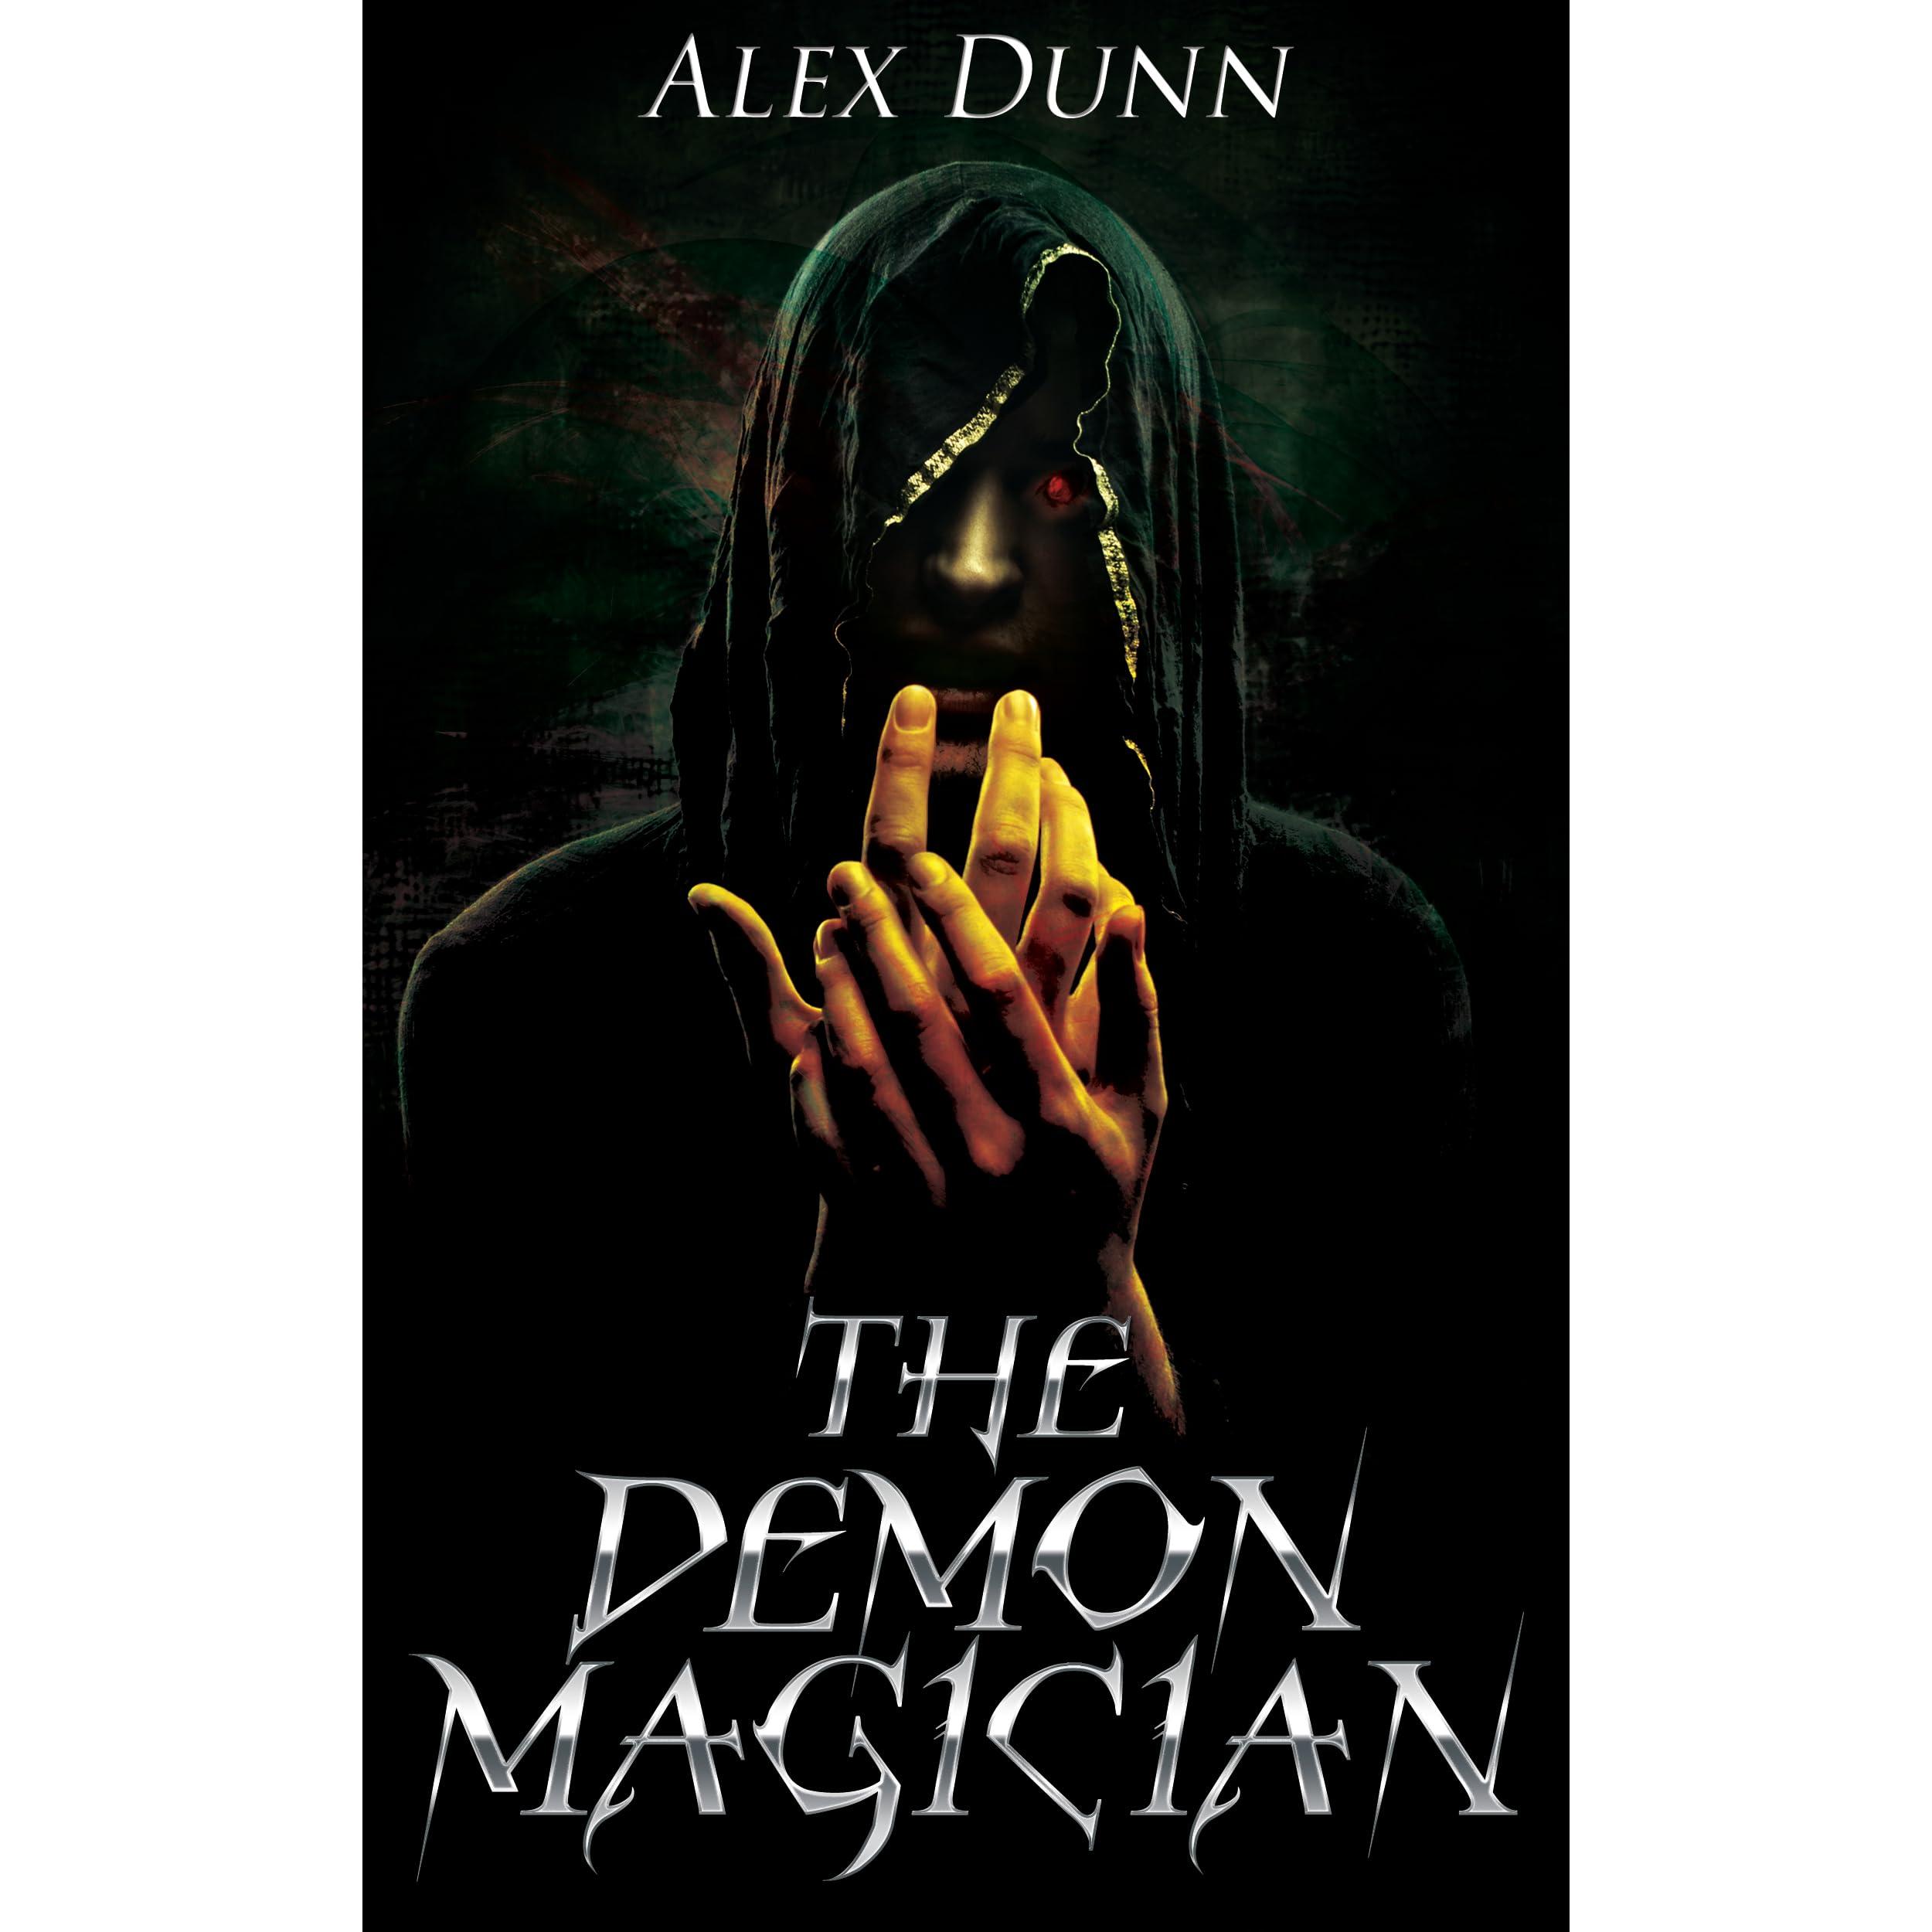 The Demon Magician by Alex Dunn